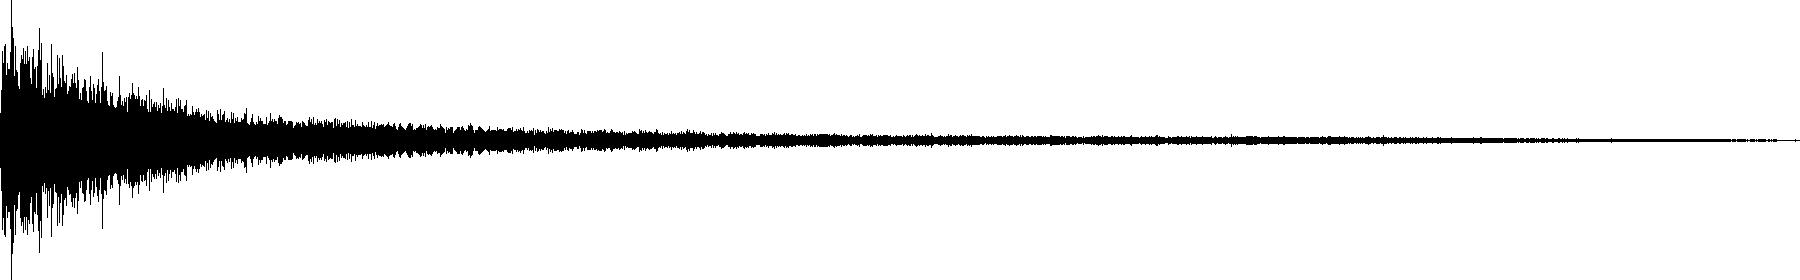 cymbal 8